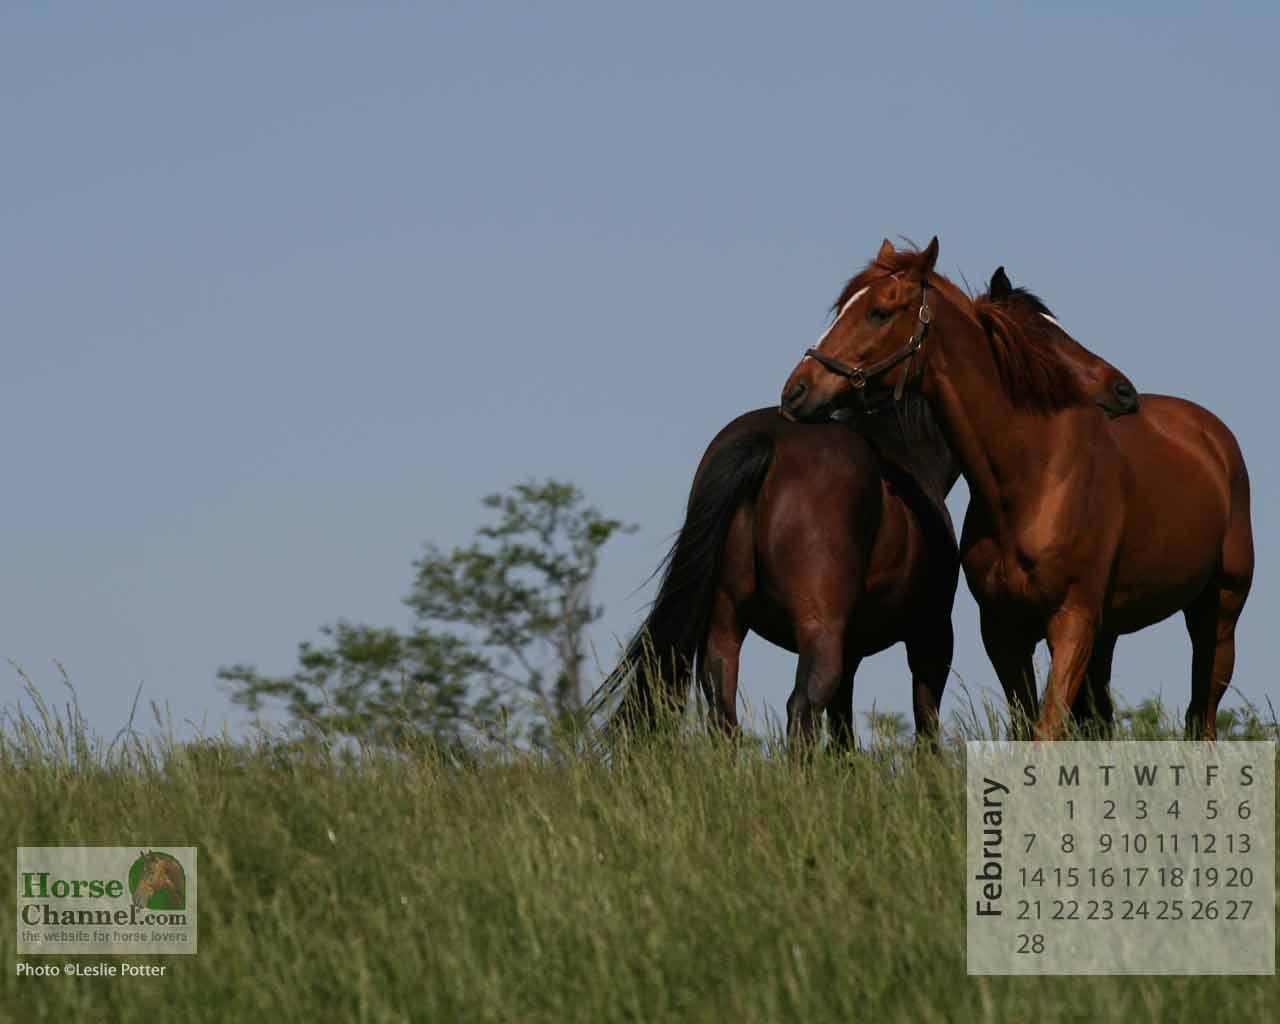 Horse Calendar Wallpaper Horse Illustrated Images, Photos, Reviews